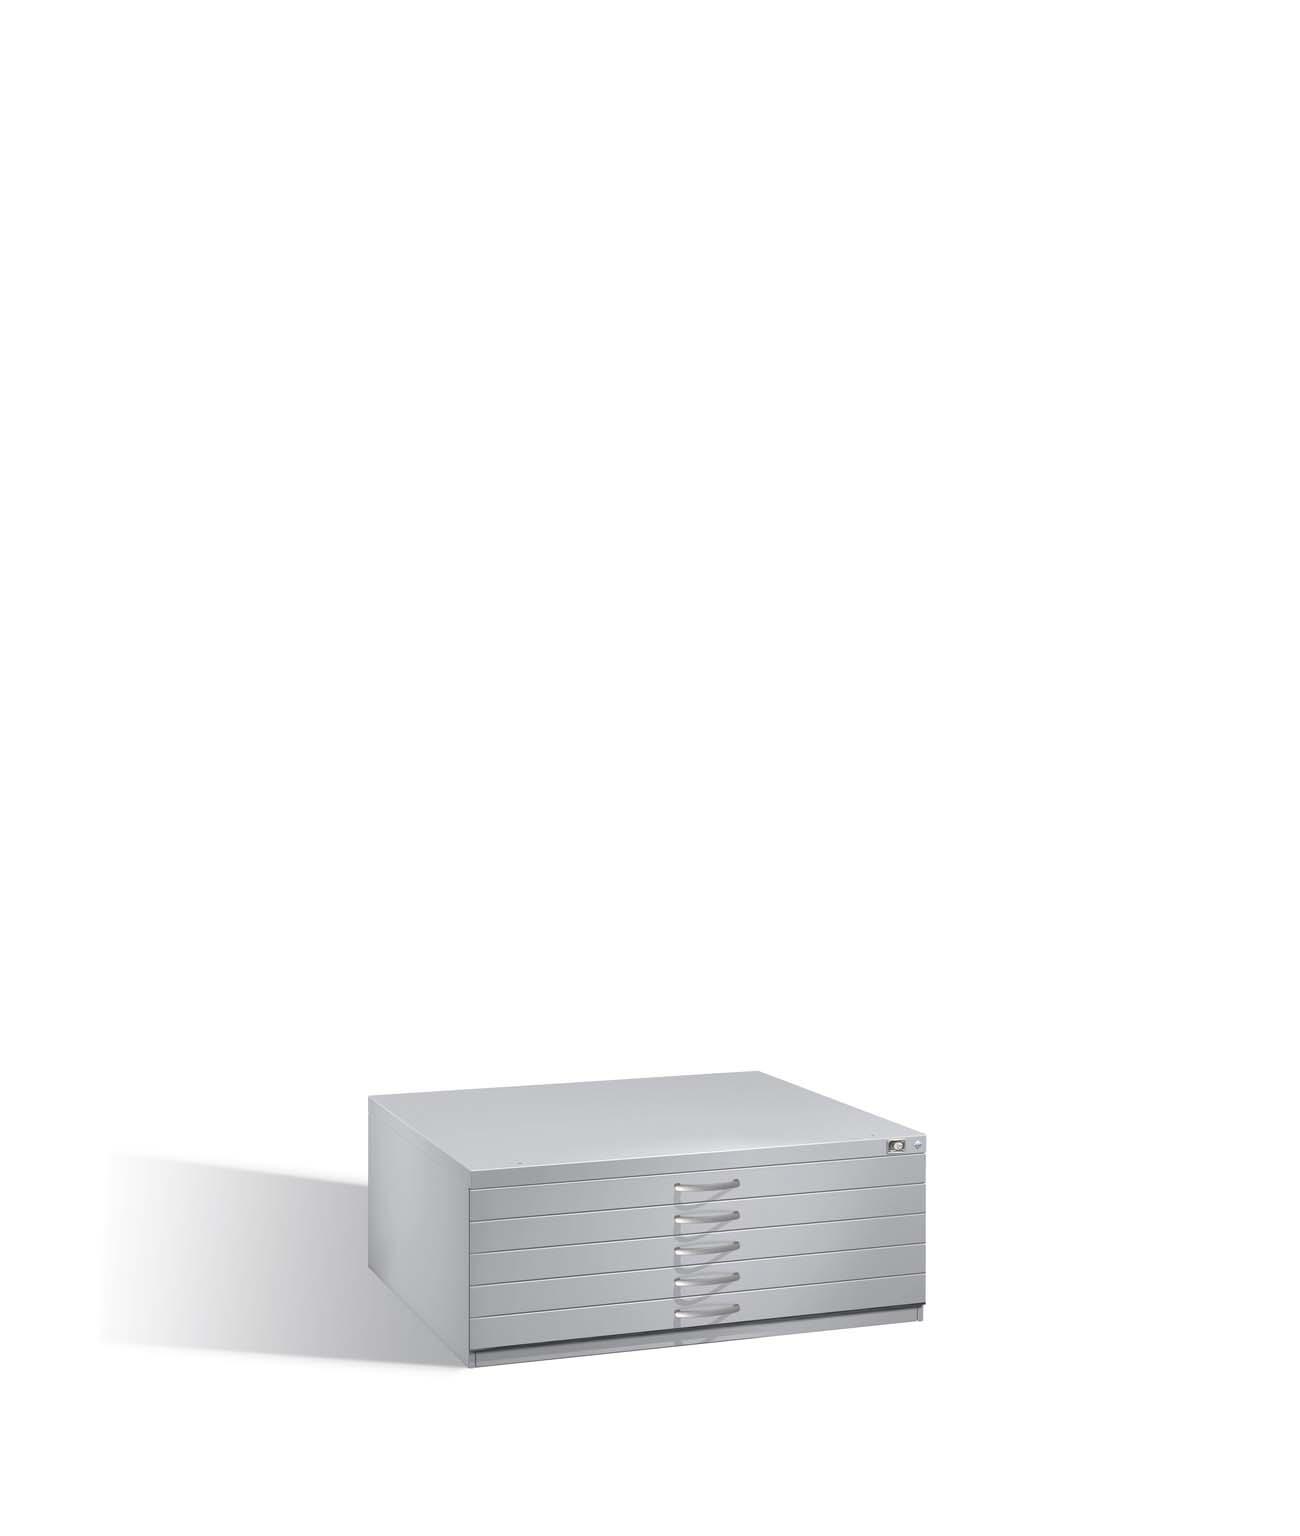 Flachablageschrank Serie 7100_7200, H420xB1100xT765mm